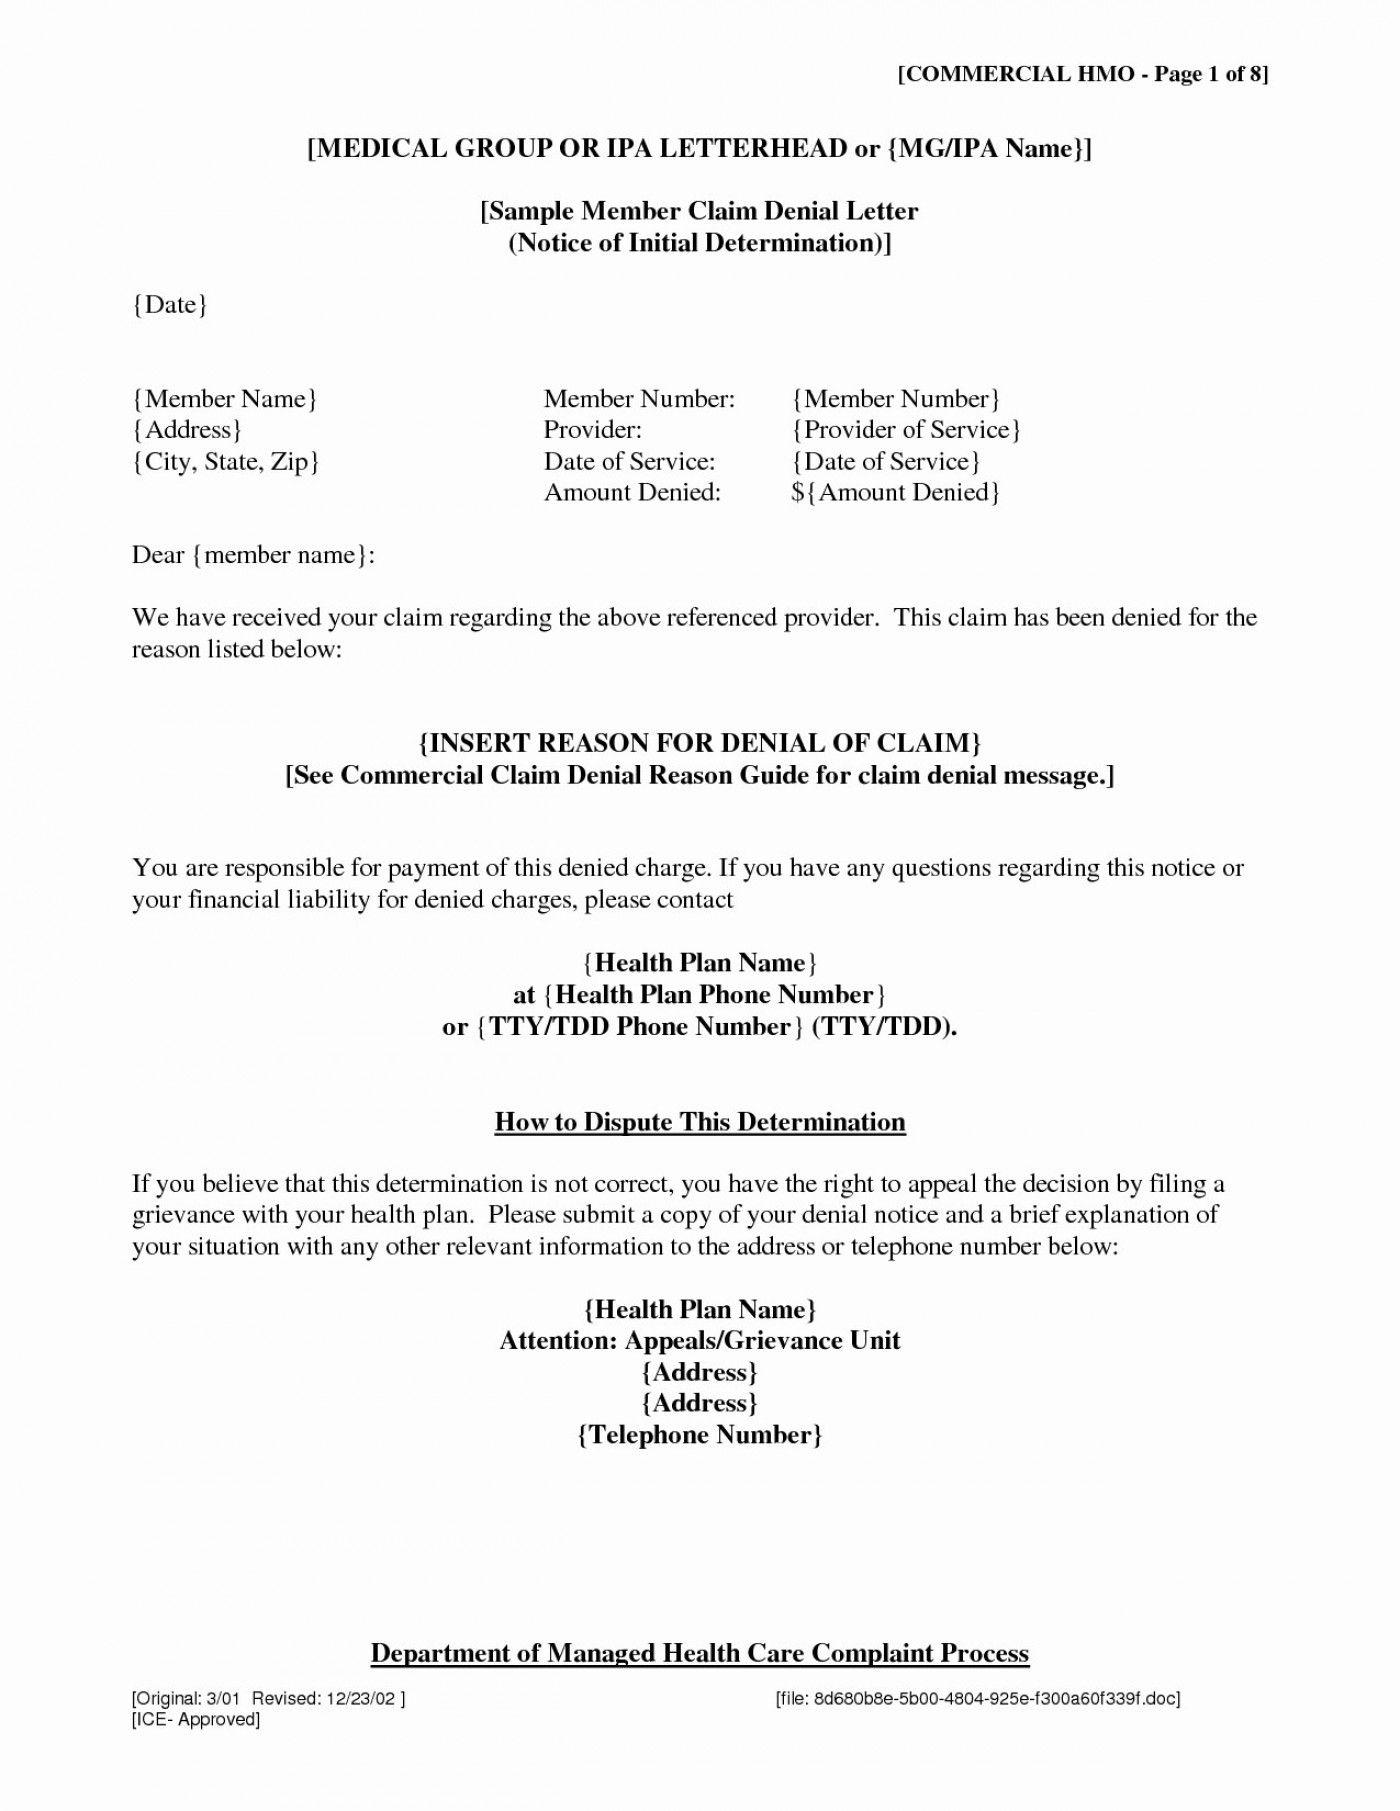 001 Insurance Denial Letter Template Excellent Ideas